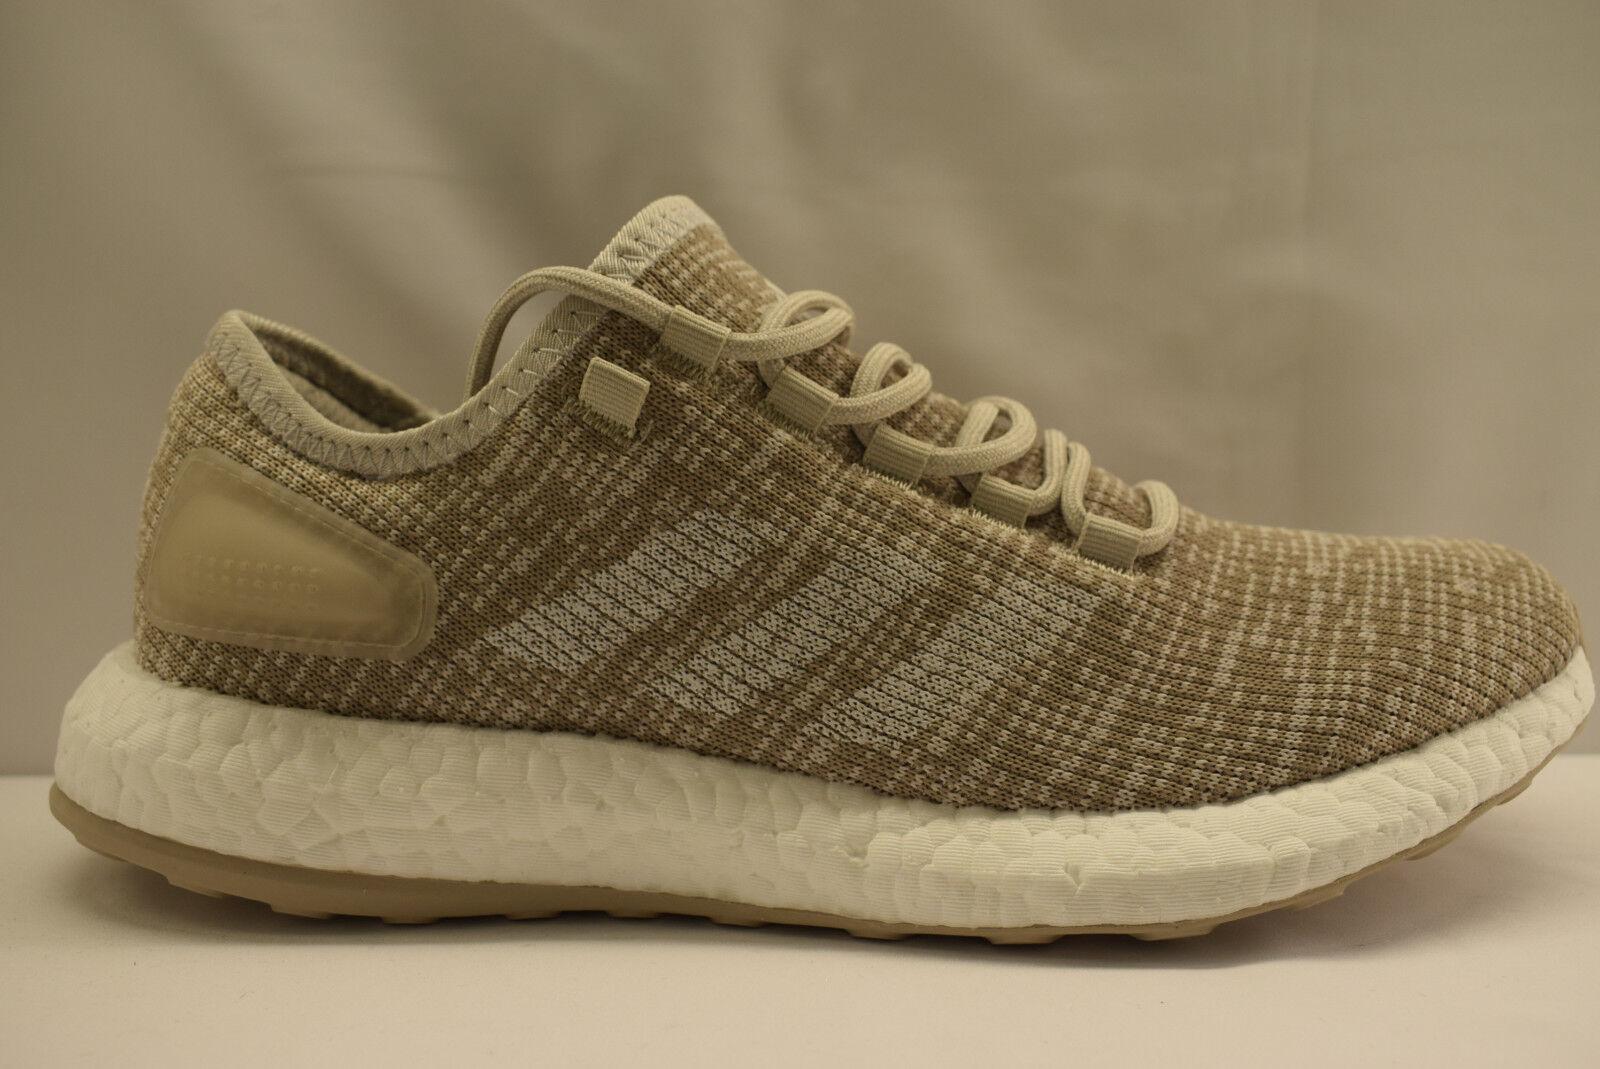 ADIDAS PureBOOST CLIMA BA9057 Sneaker Sneaker BA9057 Herrenschuhe 33d745